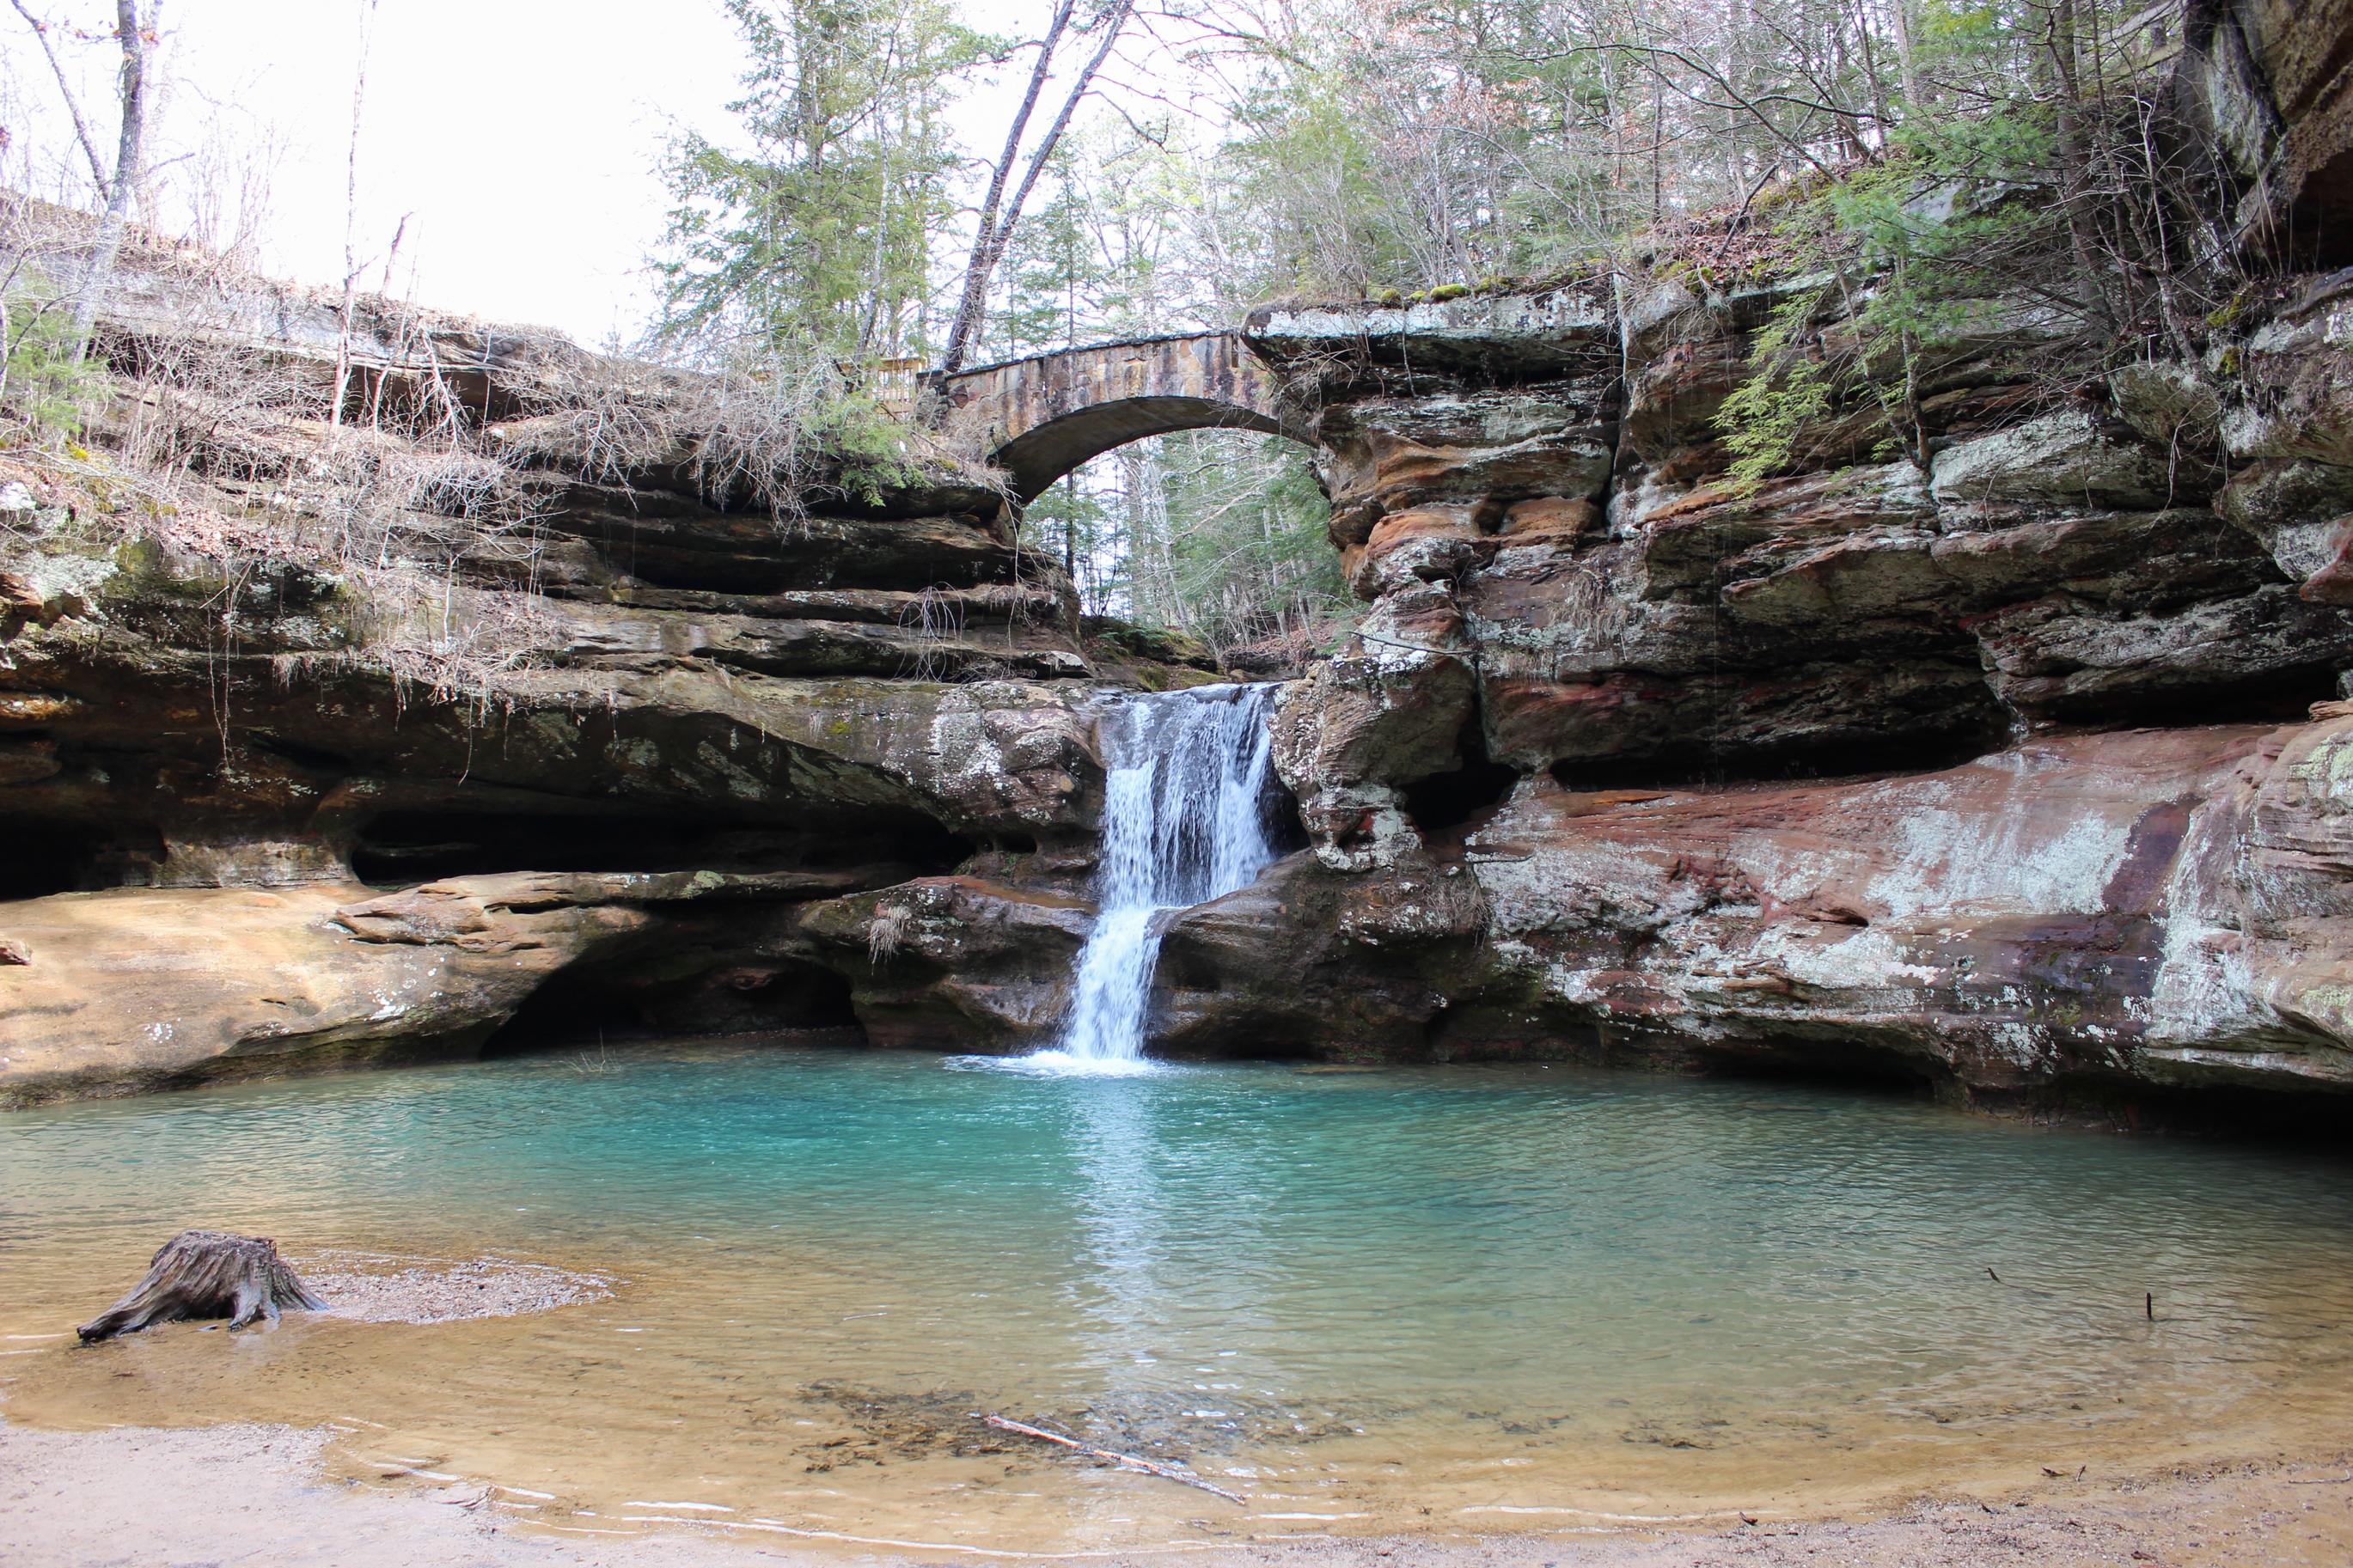 Upper falls under a stone arch bridge near old man's cave in hocking hills ohio